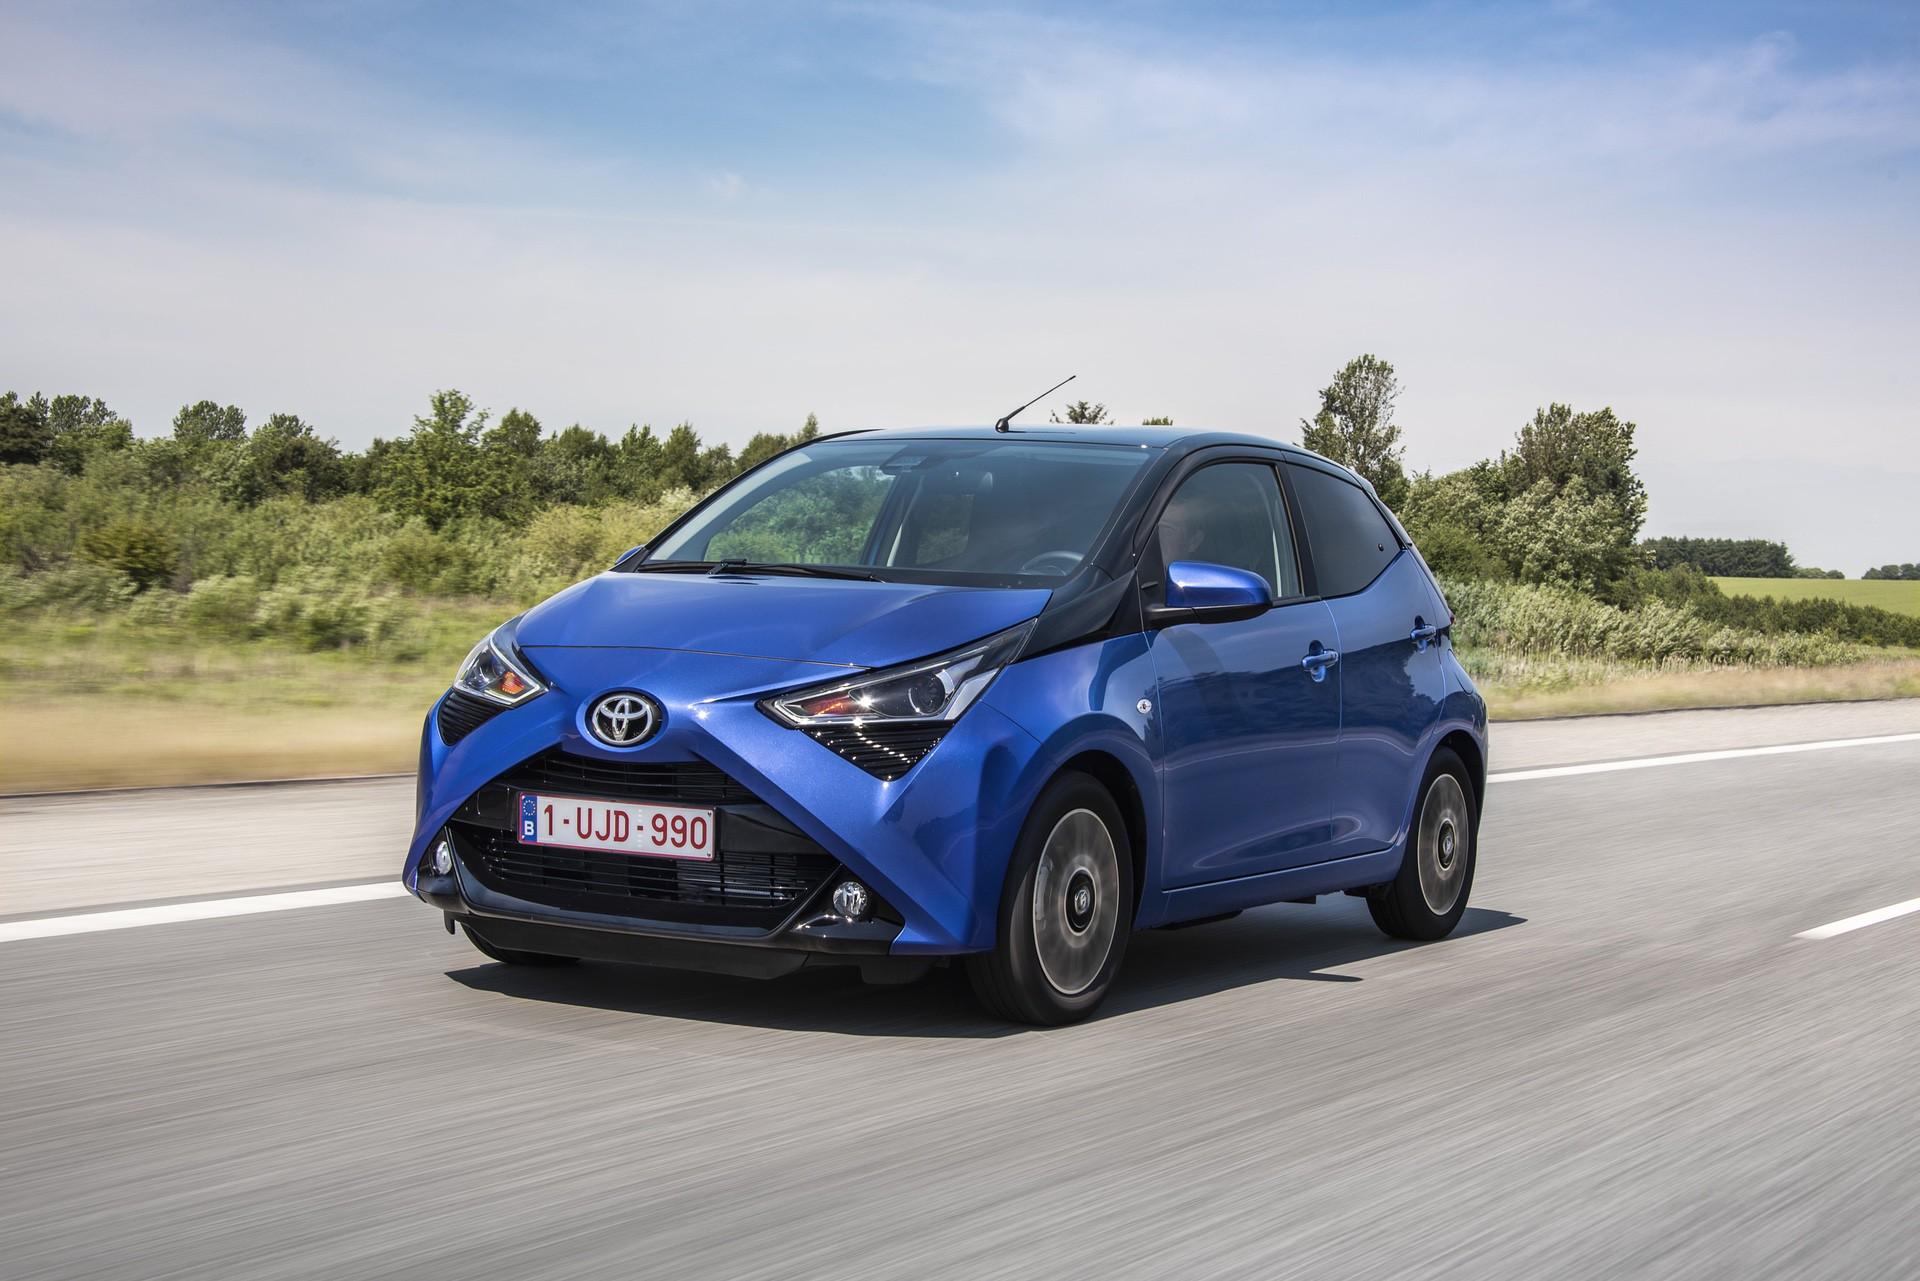 Toyota_Aygo_facelift_presskit_0006